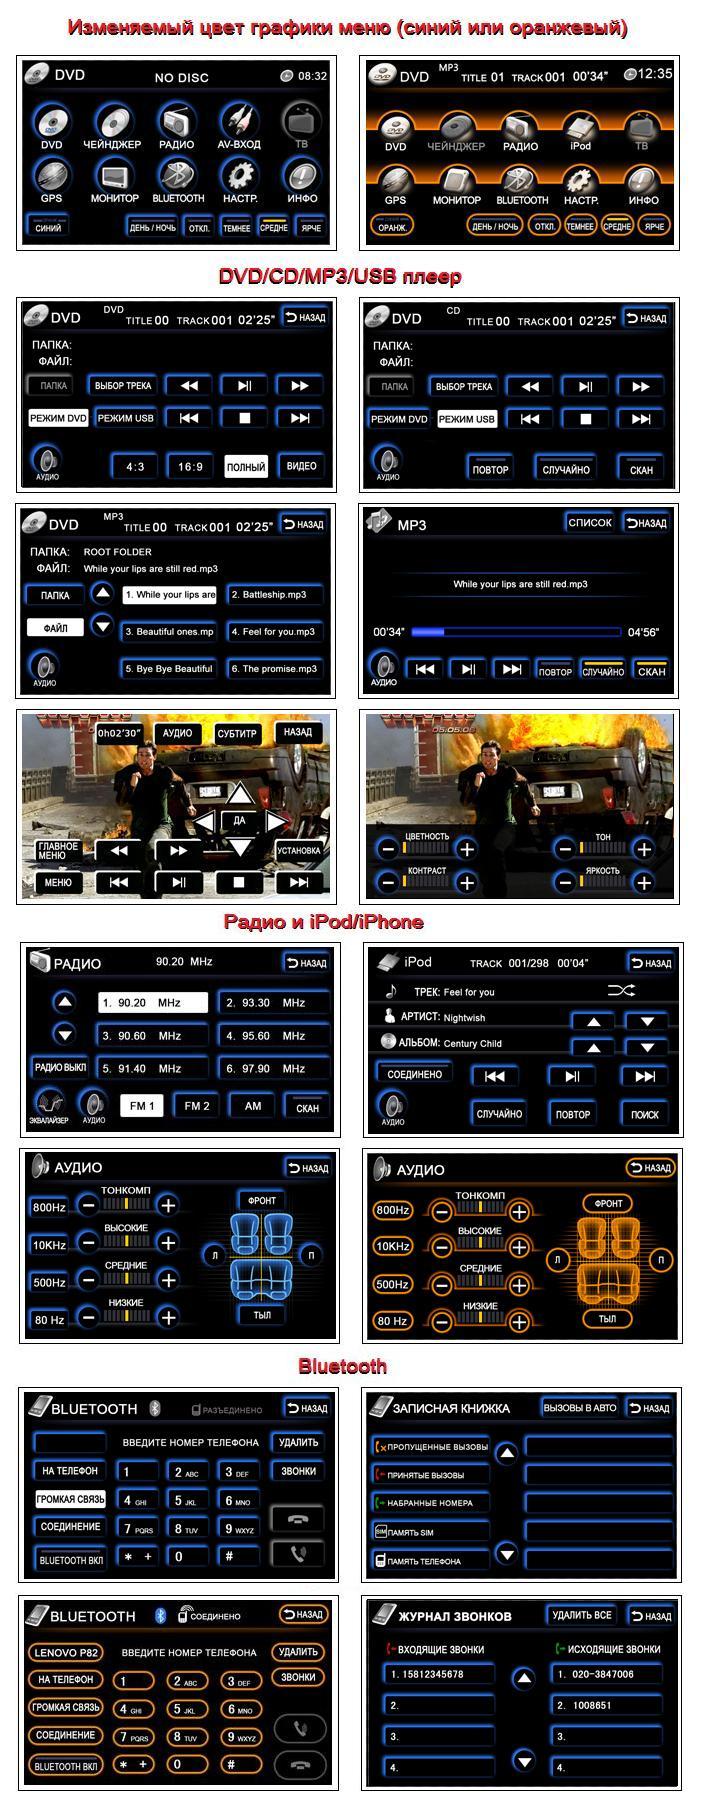 FlyAudio E7531NAVI